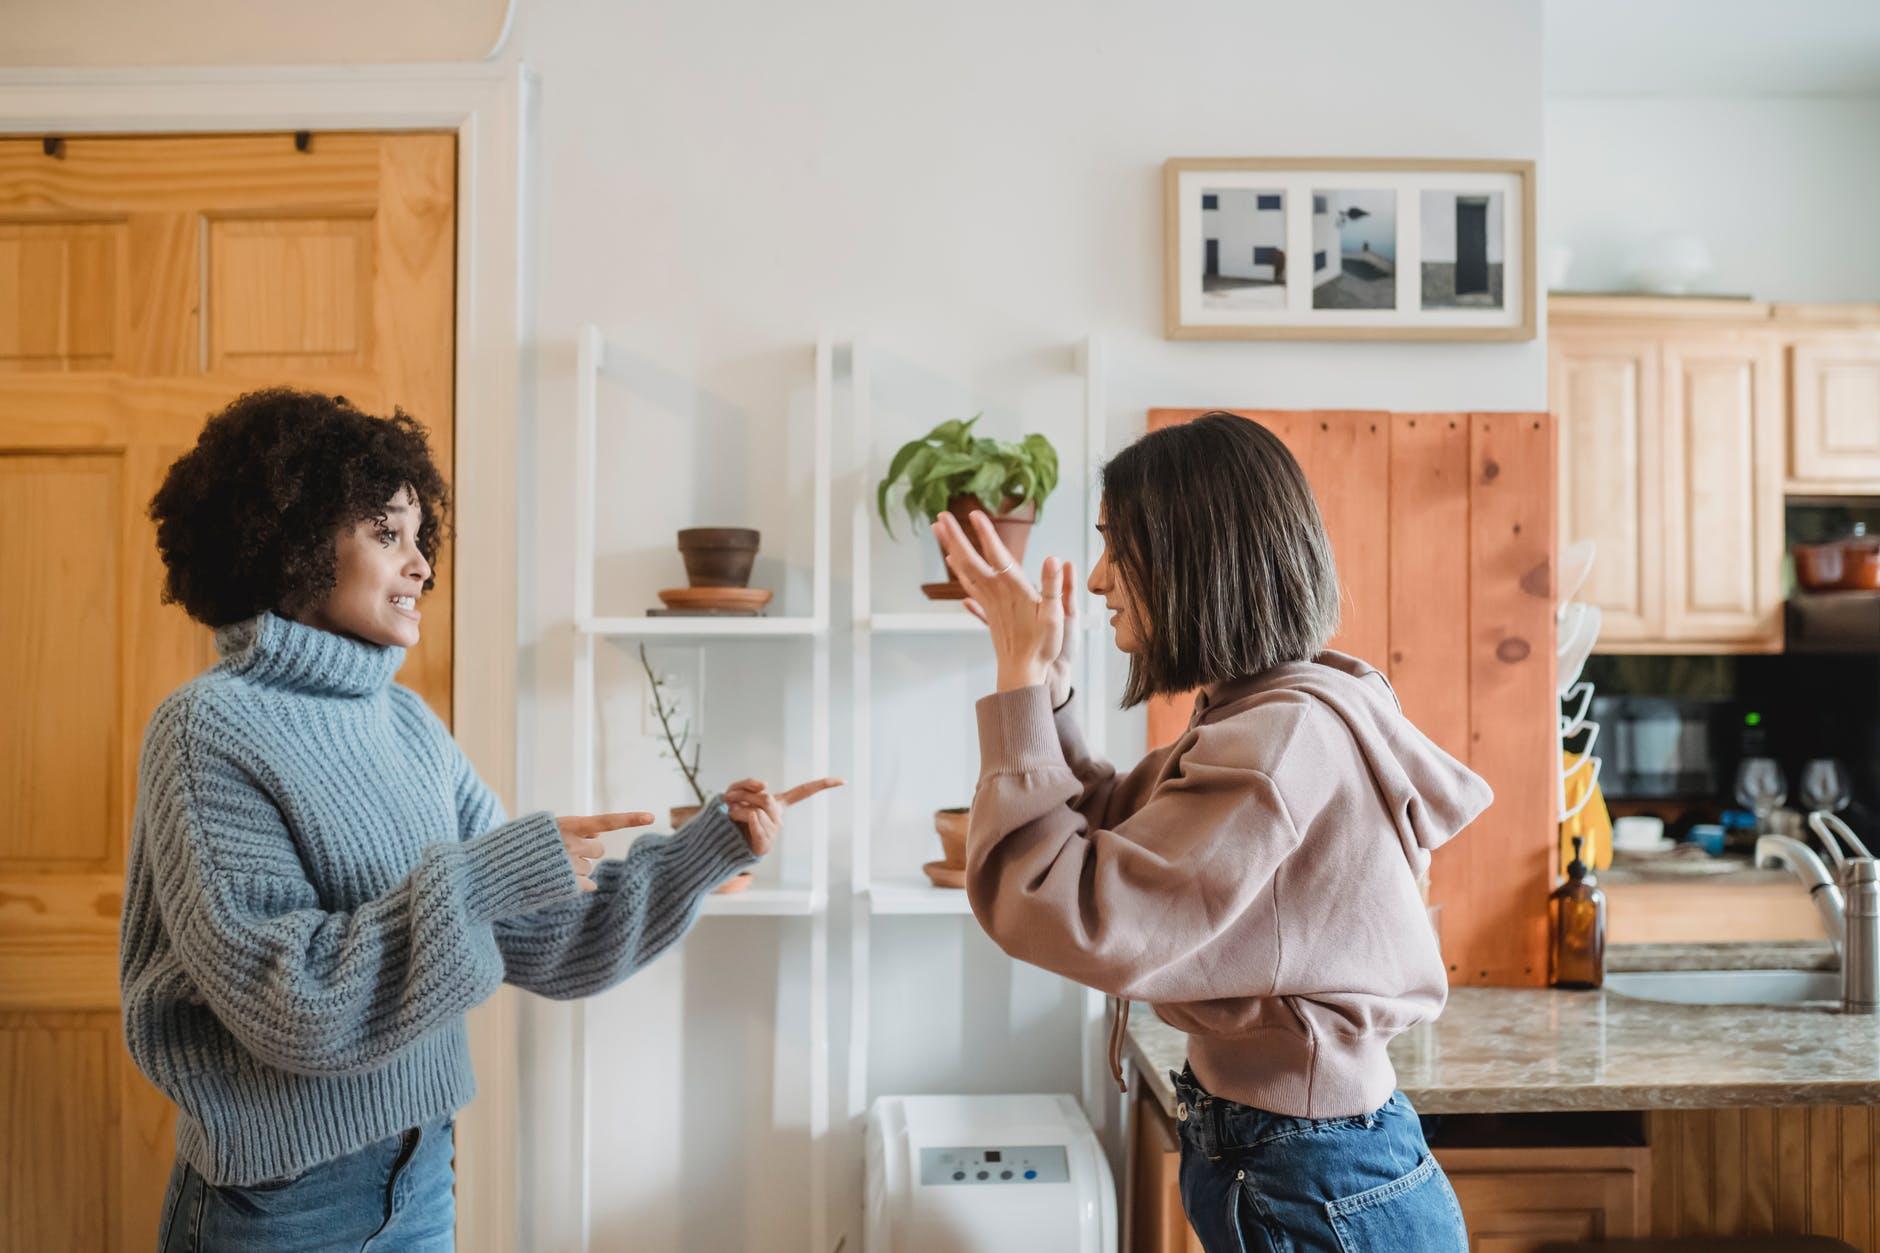 irritated multiracial women fighting in apartment